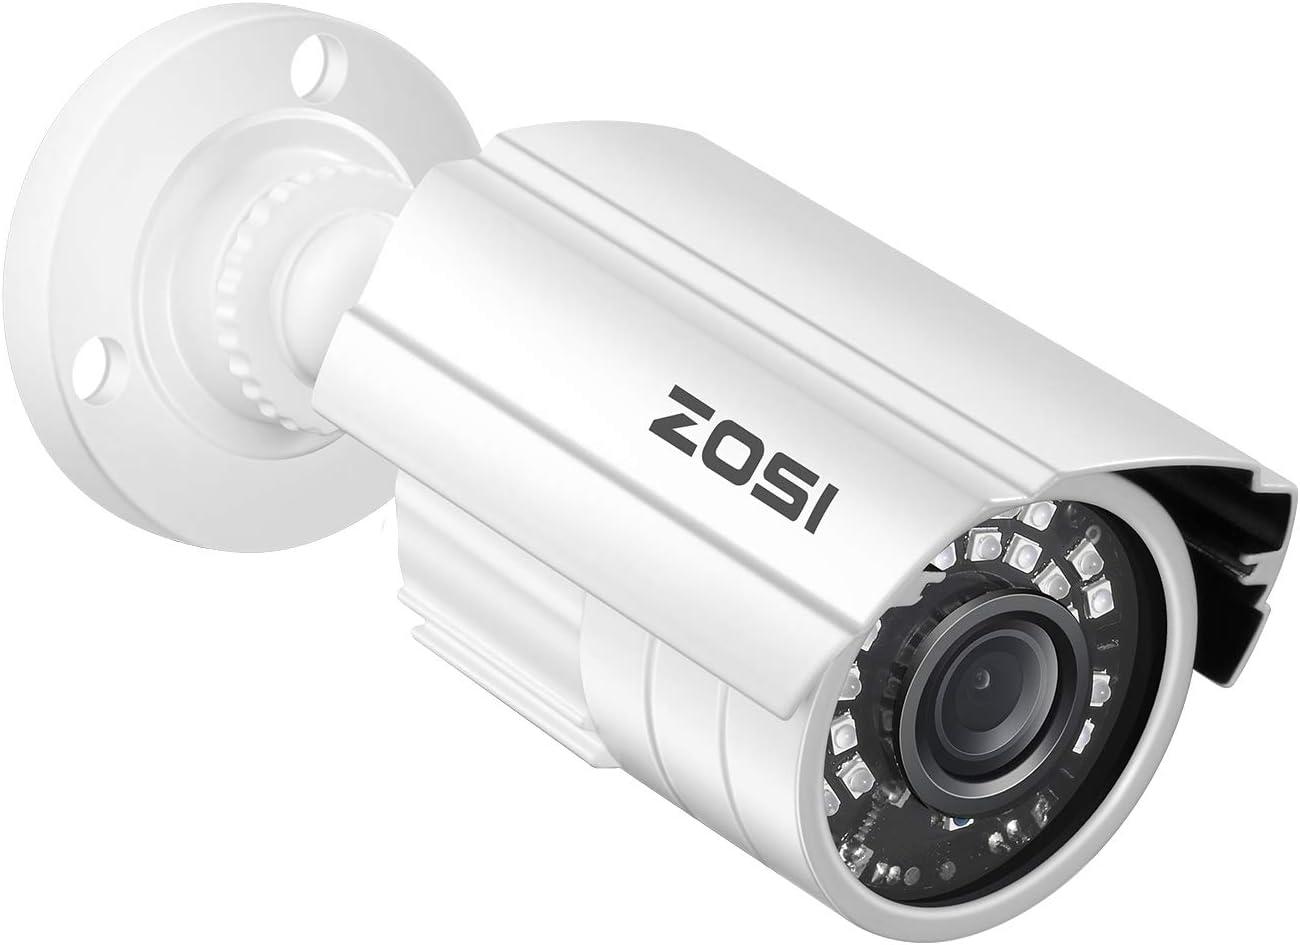 ZOSI 1080P 2.0MP HD 1920TVL Hybrid 4-in-1 TVI/CVI/AHD/960H CVBS CCTV Security Camera Indoor Outdoor, 80ft Night Vision,Aluminum Metal Cam, For 960H,720P,1080P,5MP,4K analog Surveillance DVR (White)